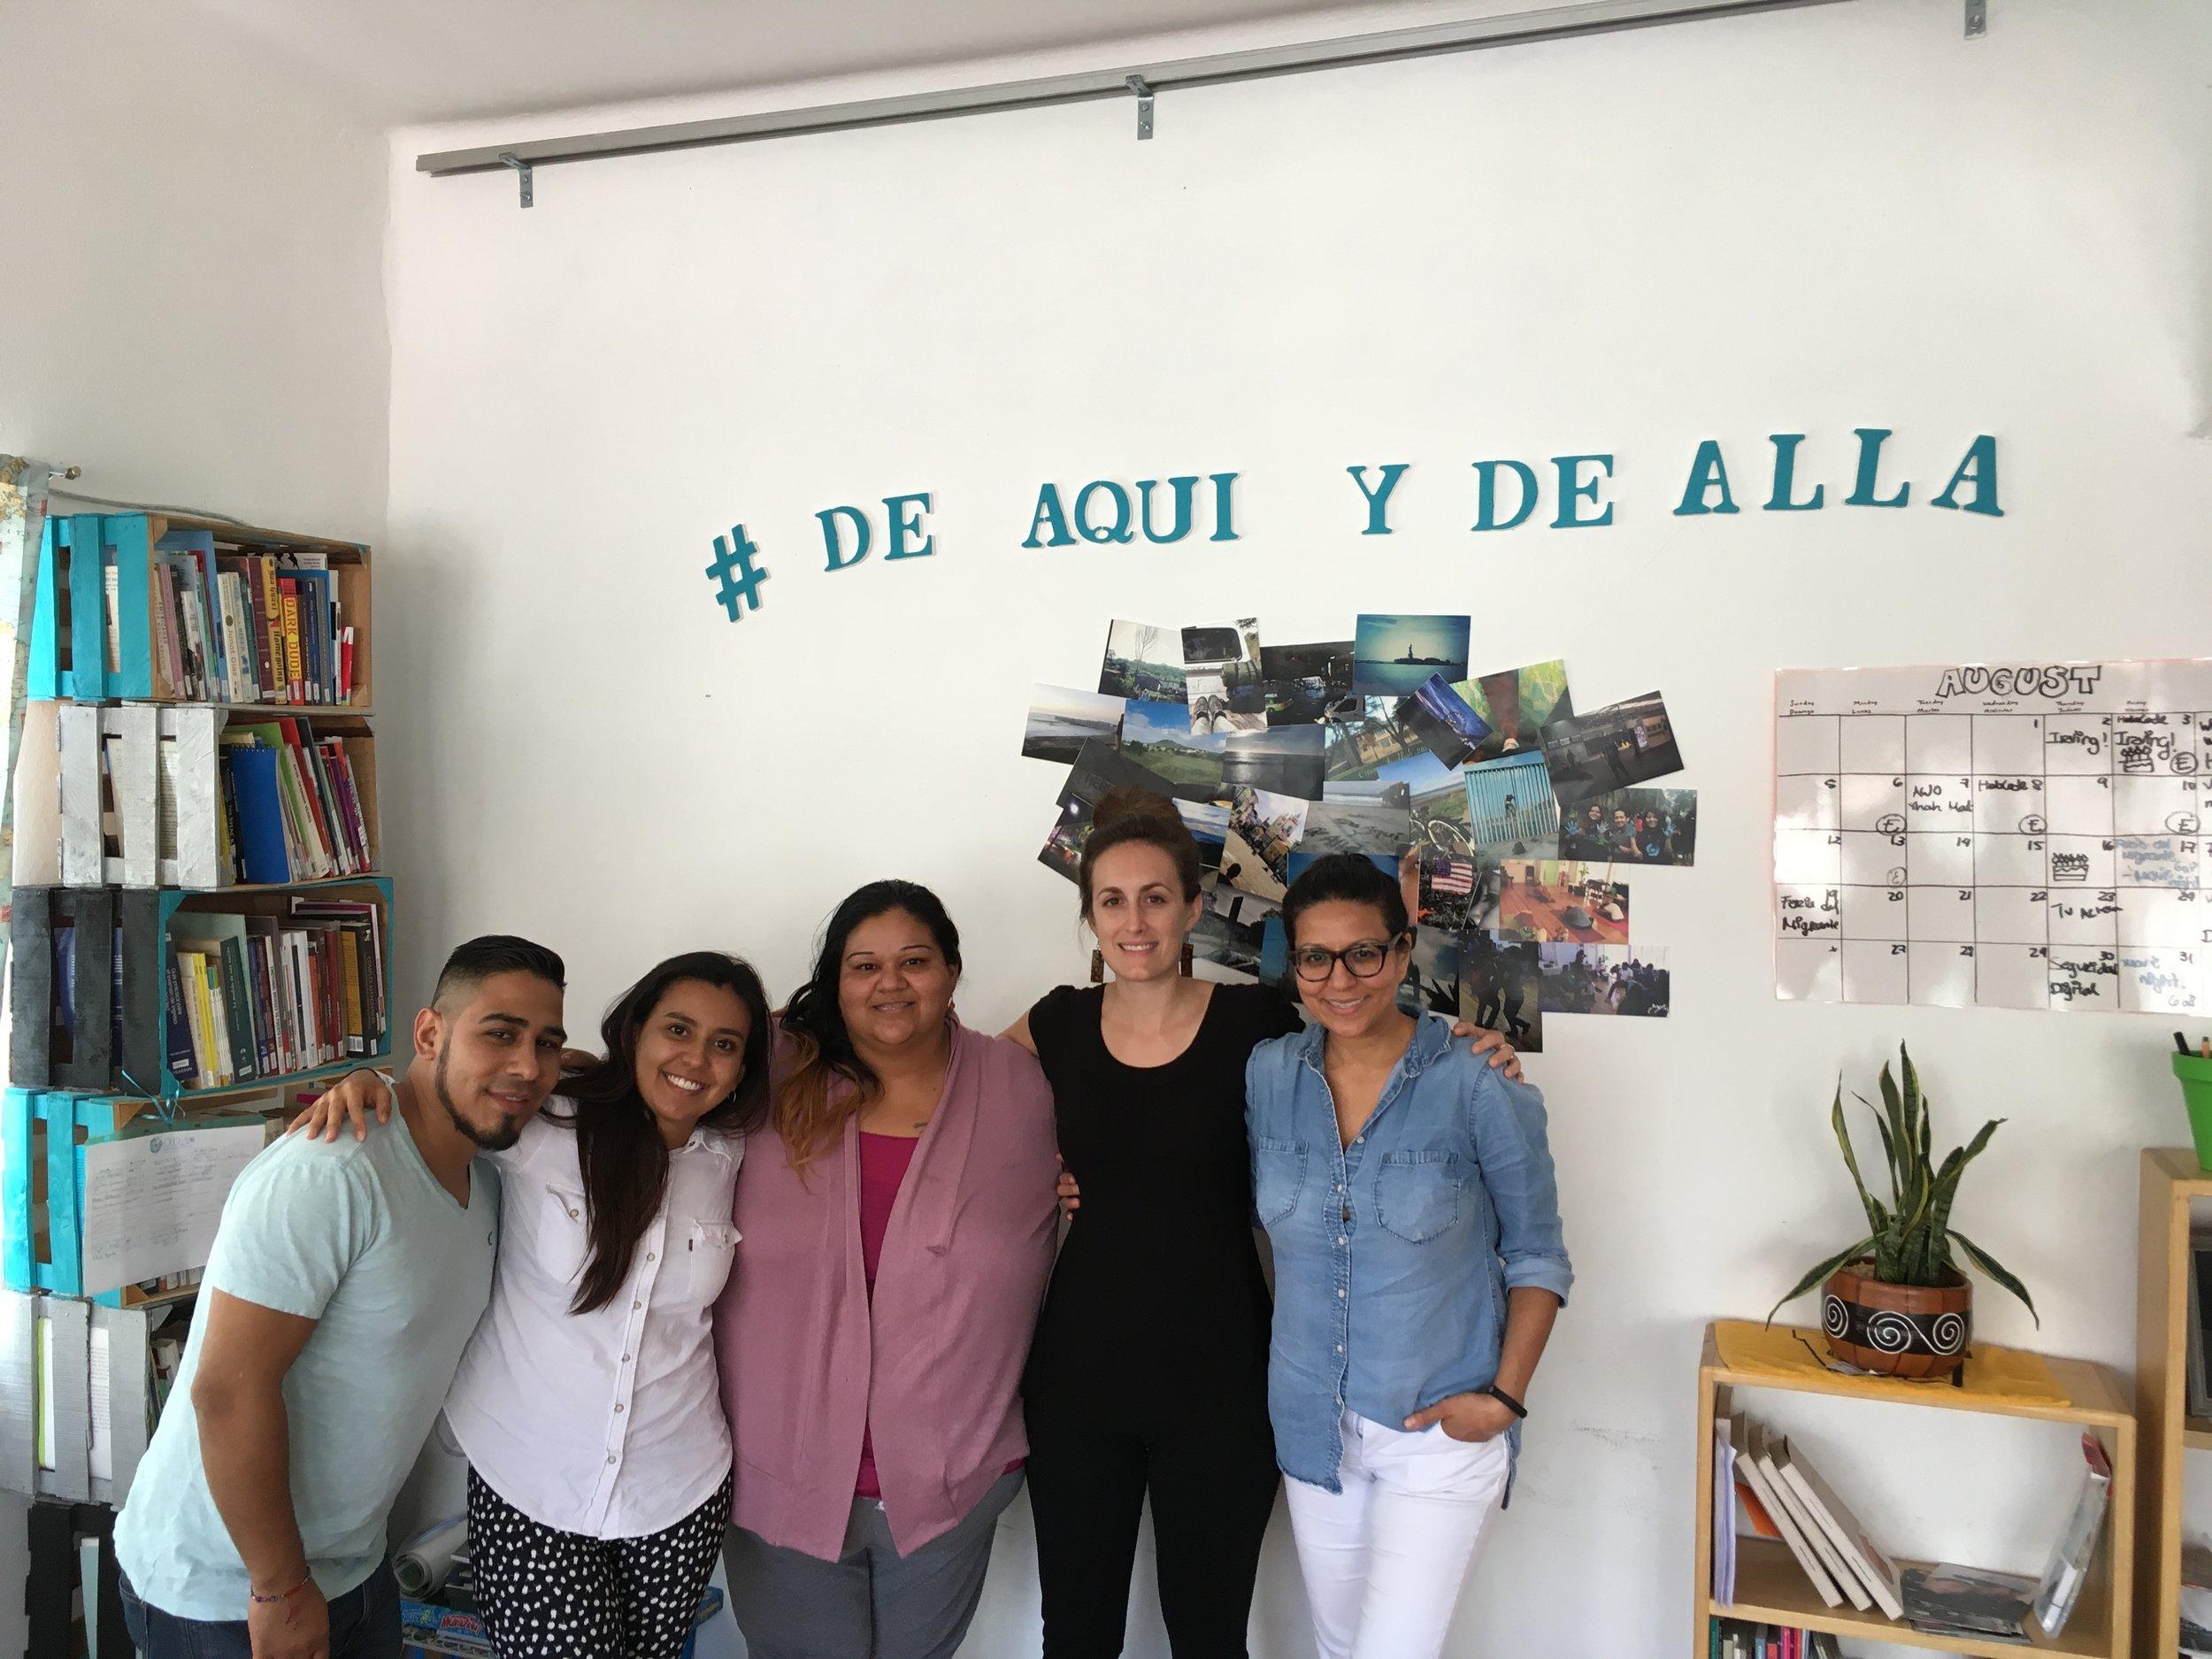 Groundswell's Communications Coordinator Fanny García and Bronx Housing Organizer Addie Alexander meet members of Otros Dreams en Acción in México City in September, 2018.